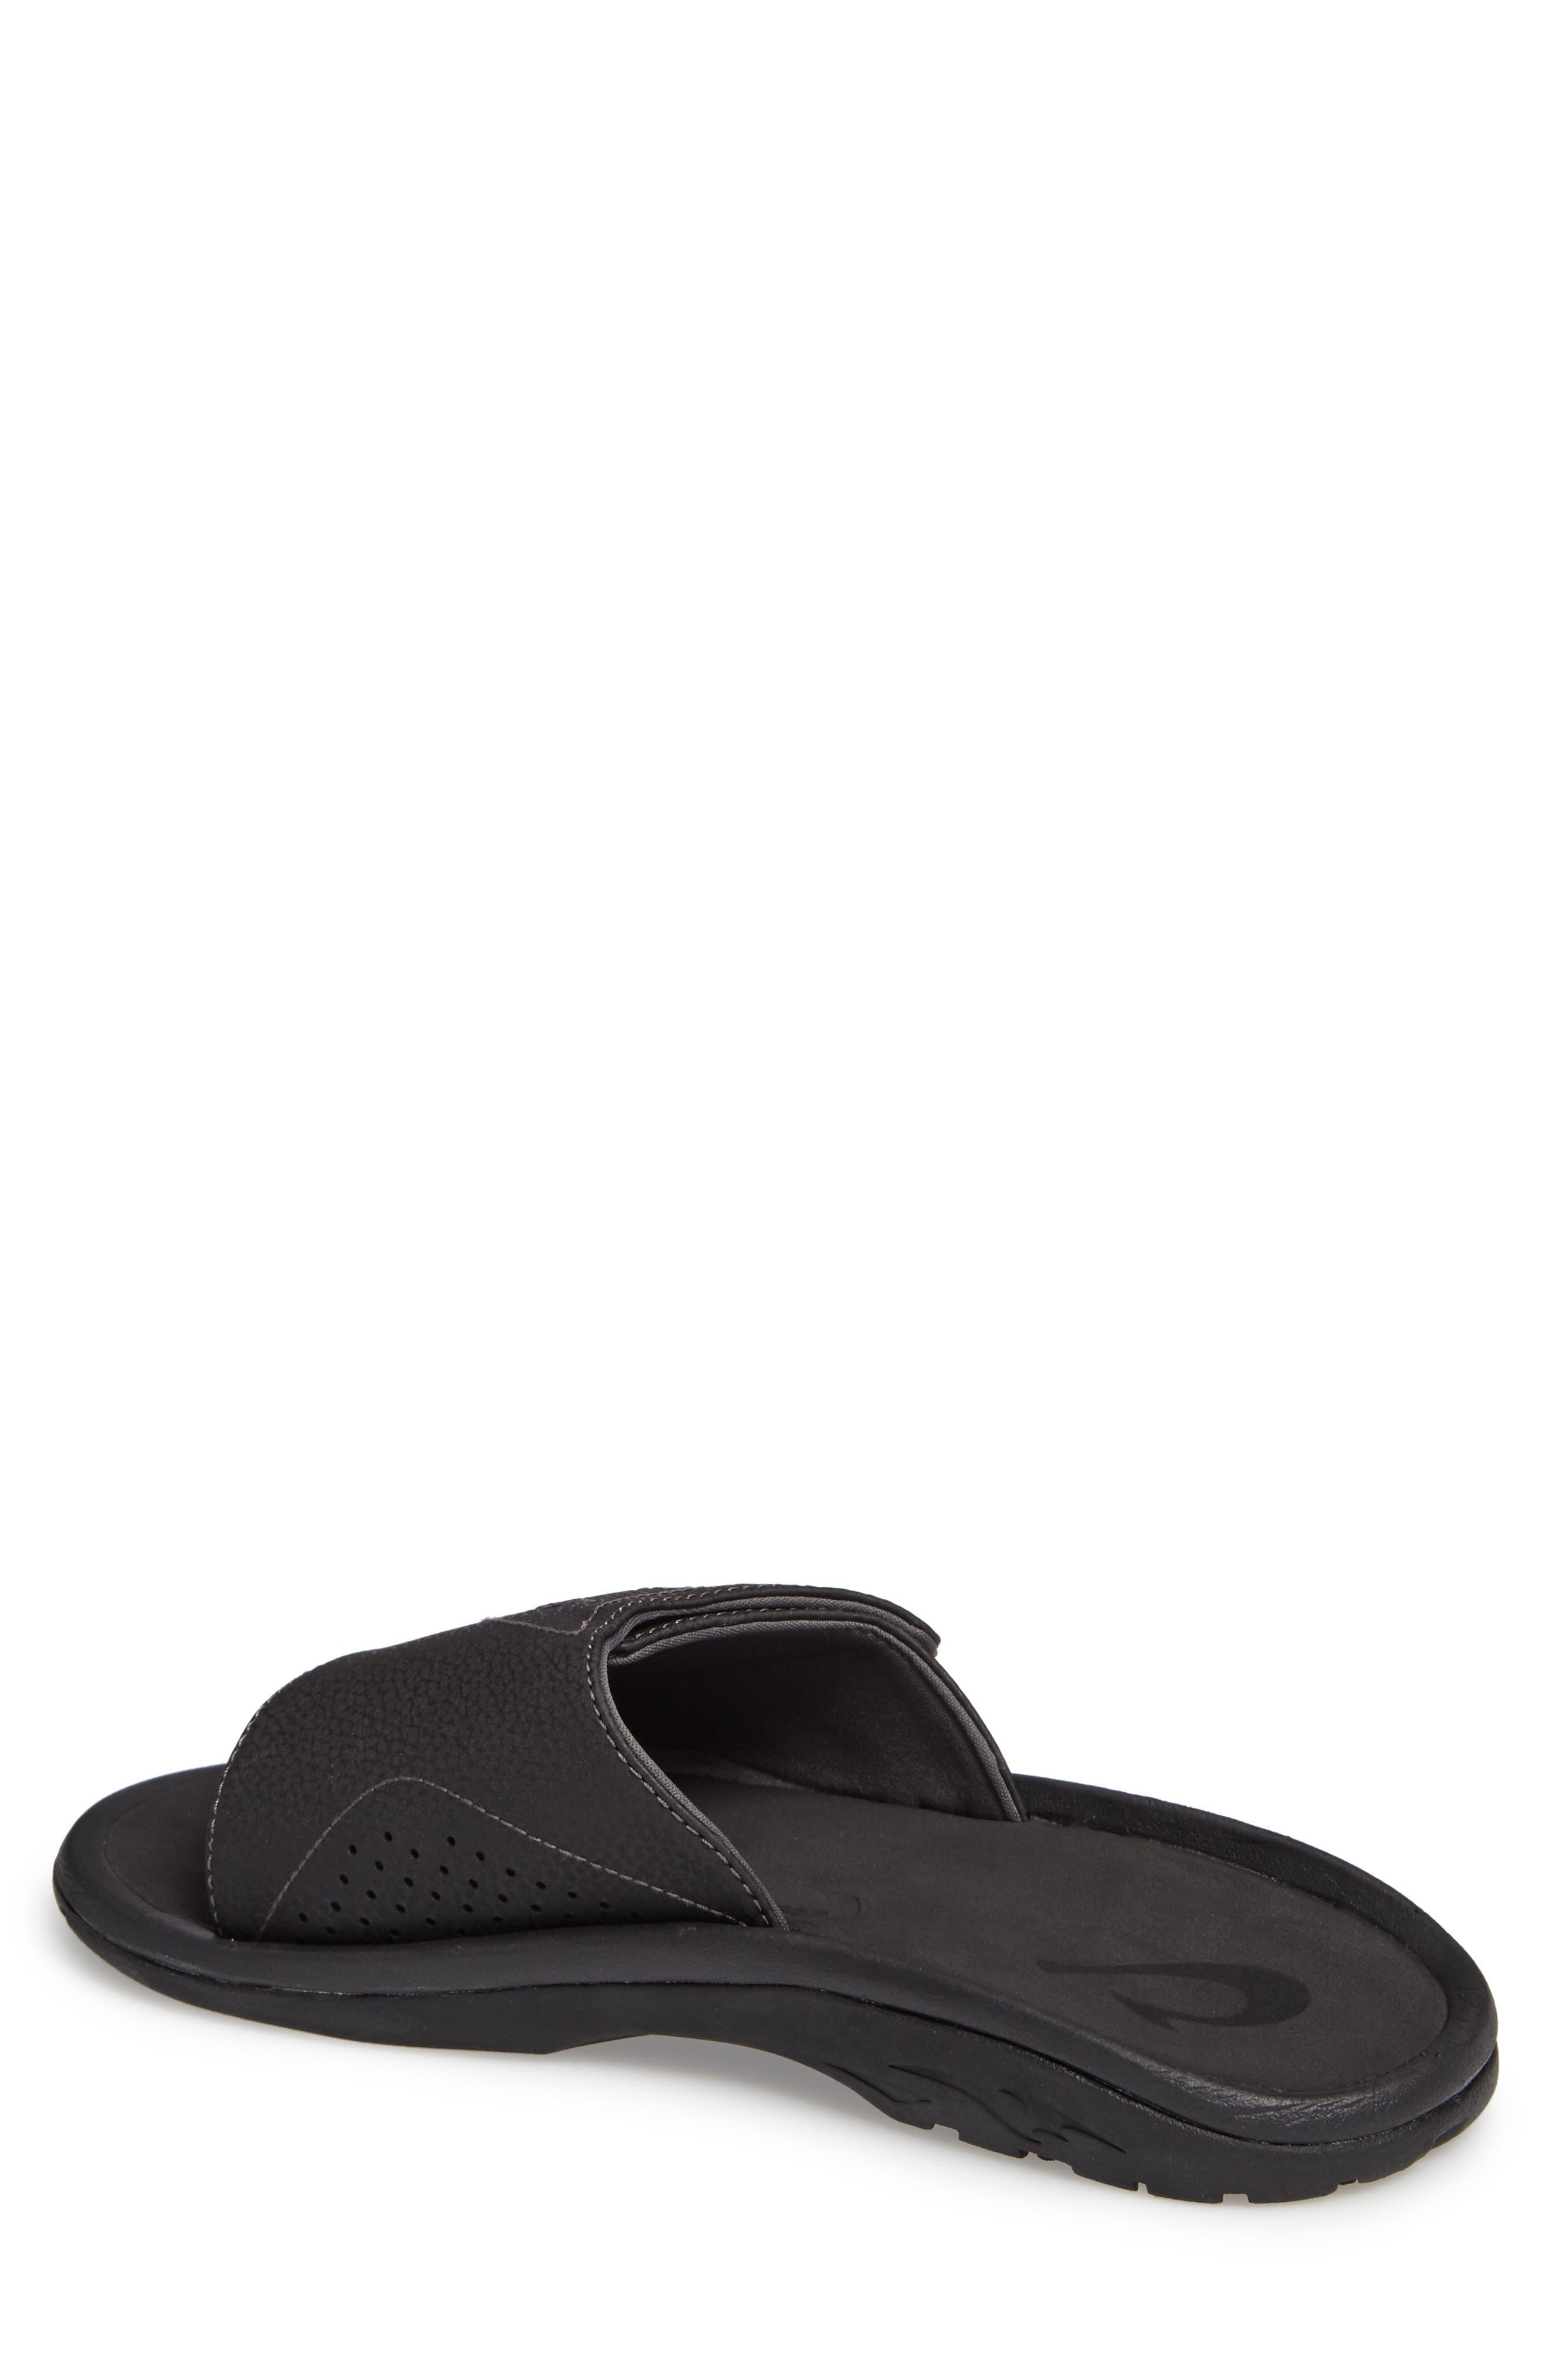 Nalu Slide Sandal,                             Alternate thumbnail 2, color,                             BLACK/ BLACK